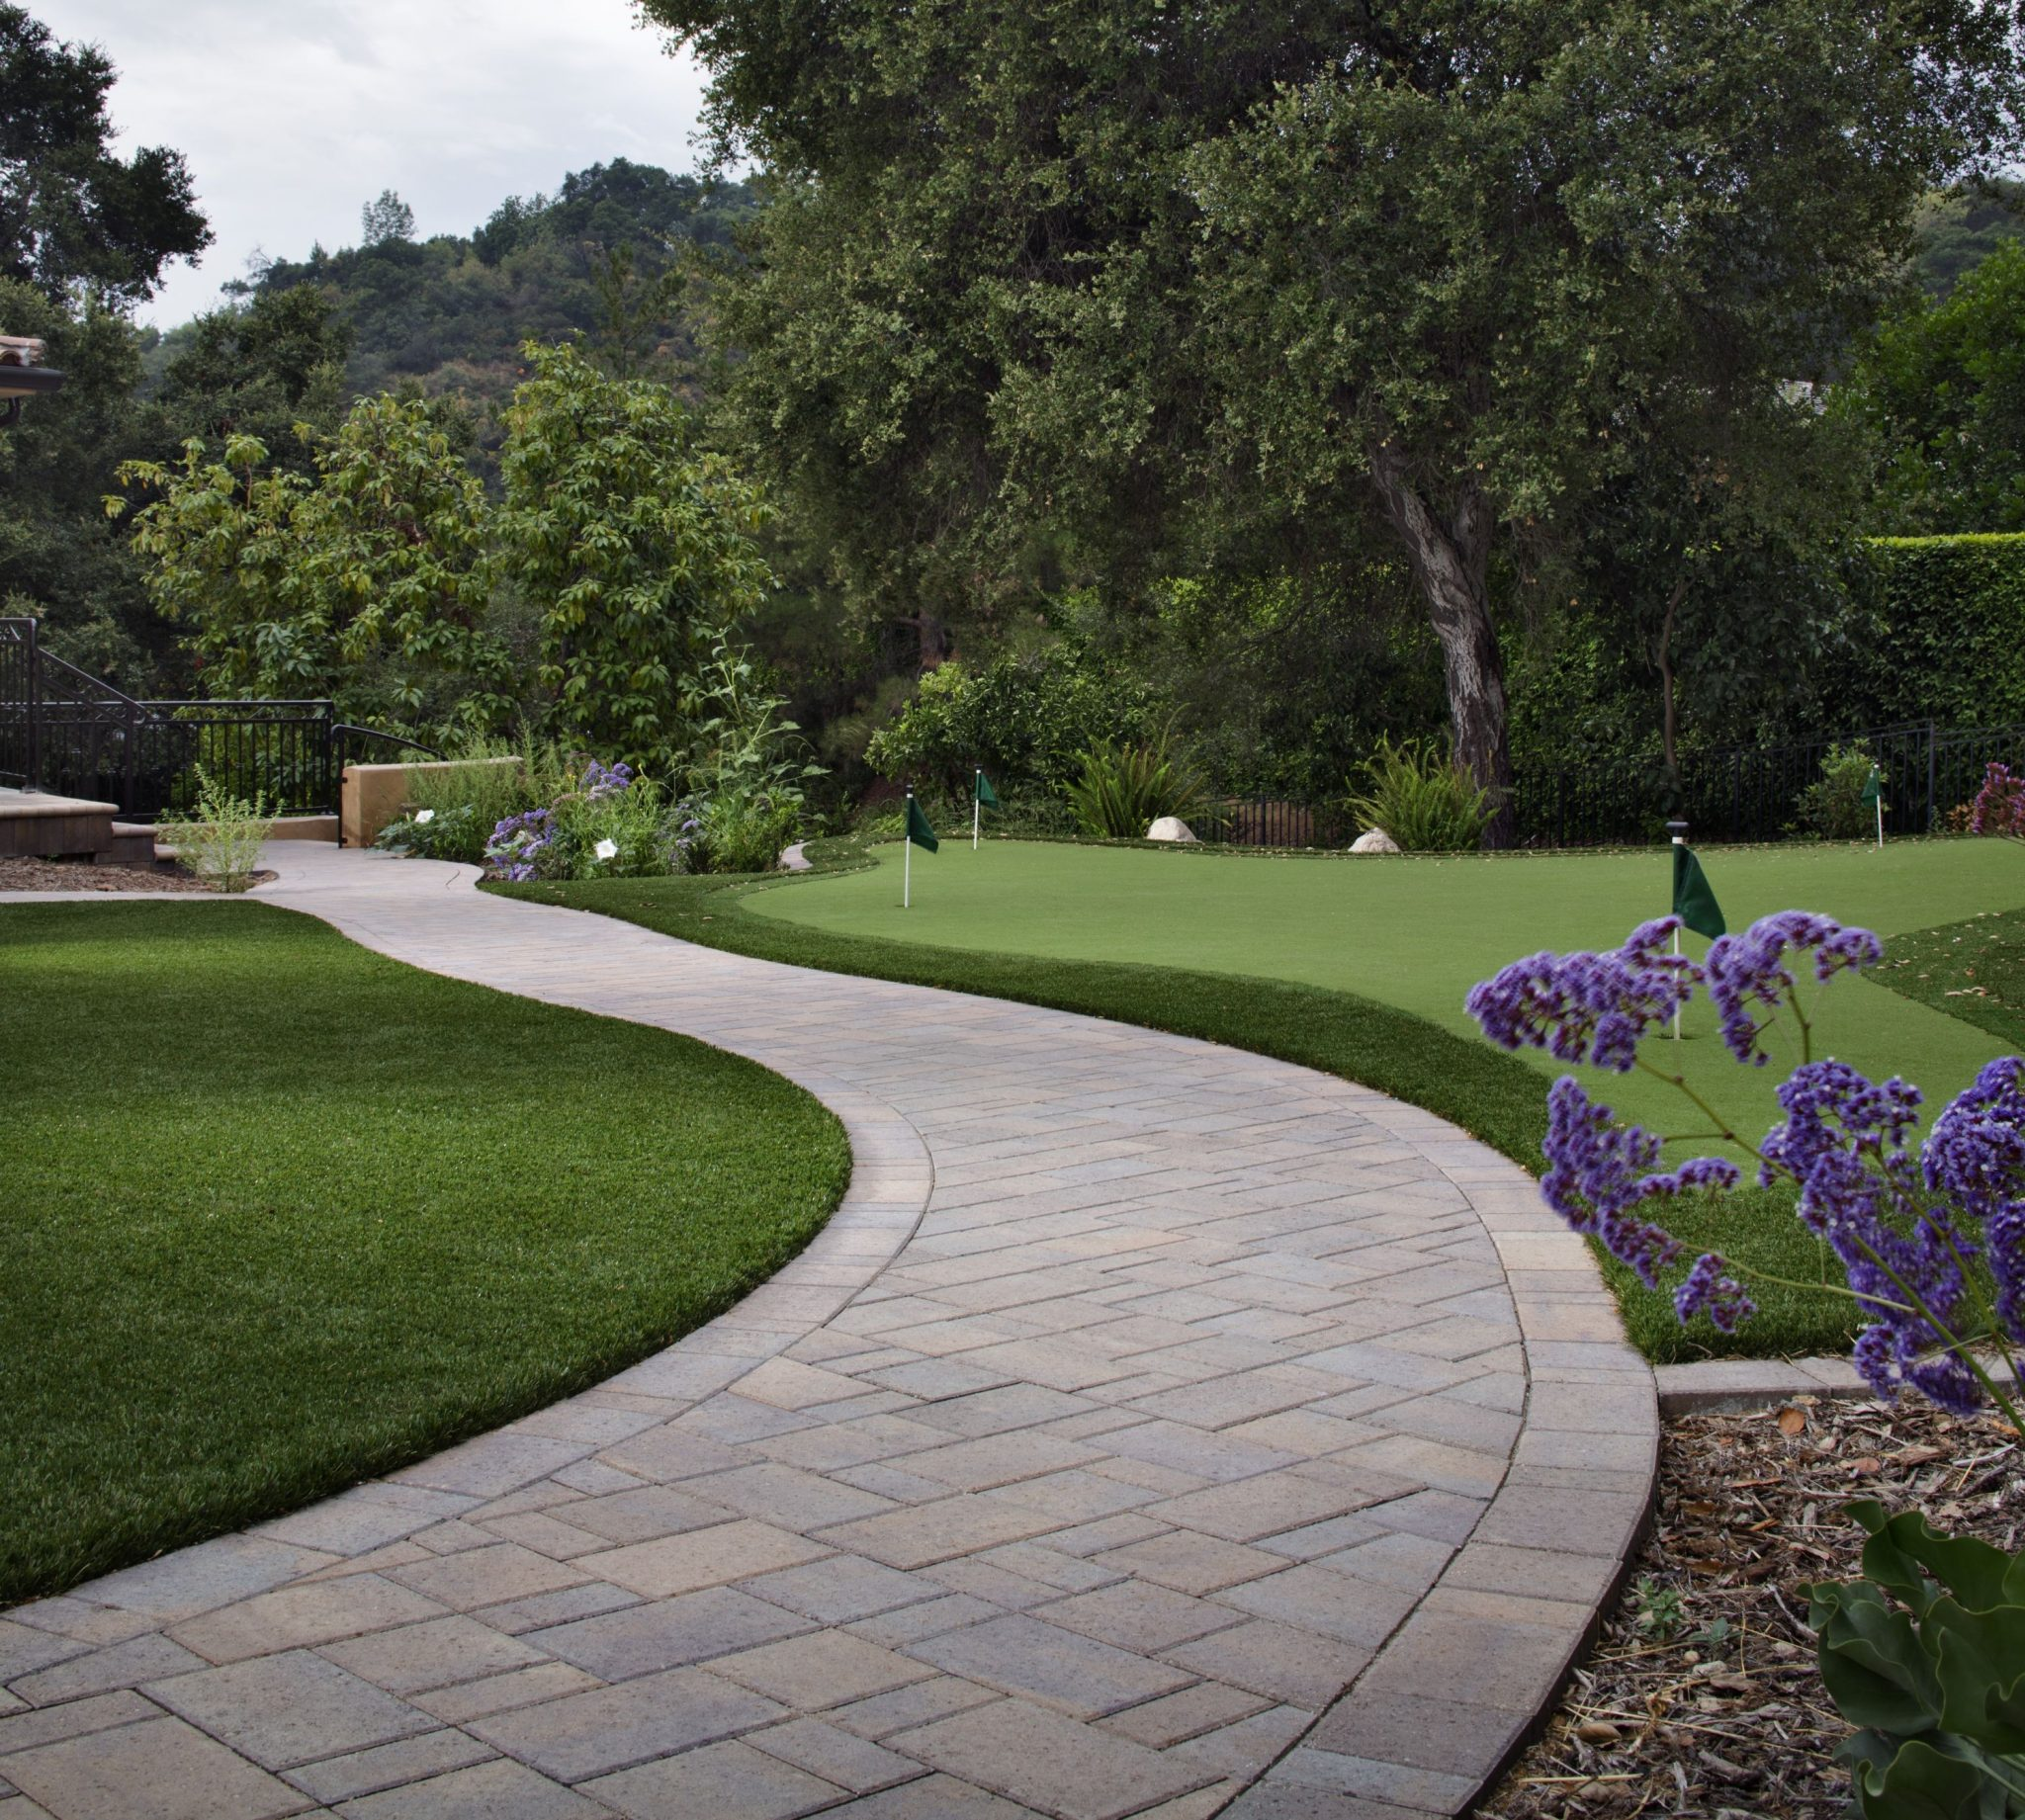 Landscape Edging Ideas for Artificial Grass Lawns